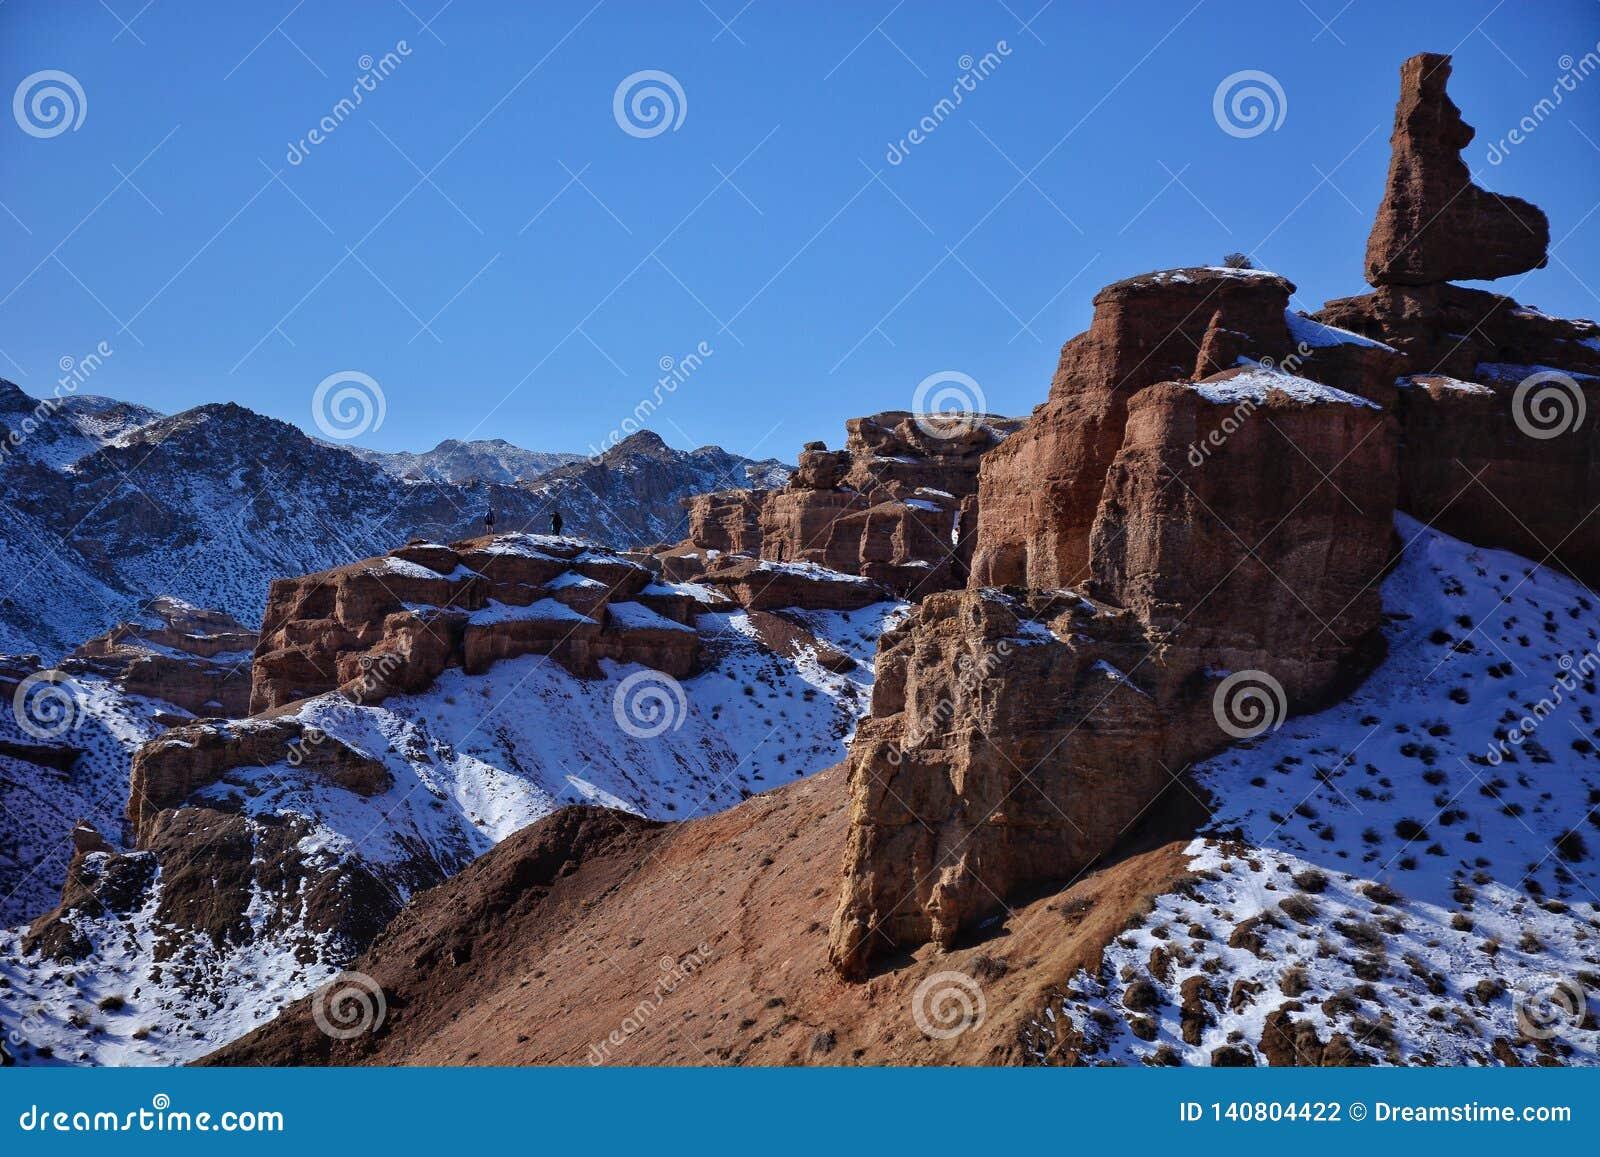 De Canion van Charyn in Kazachstan